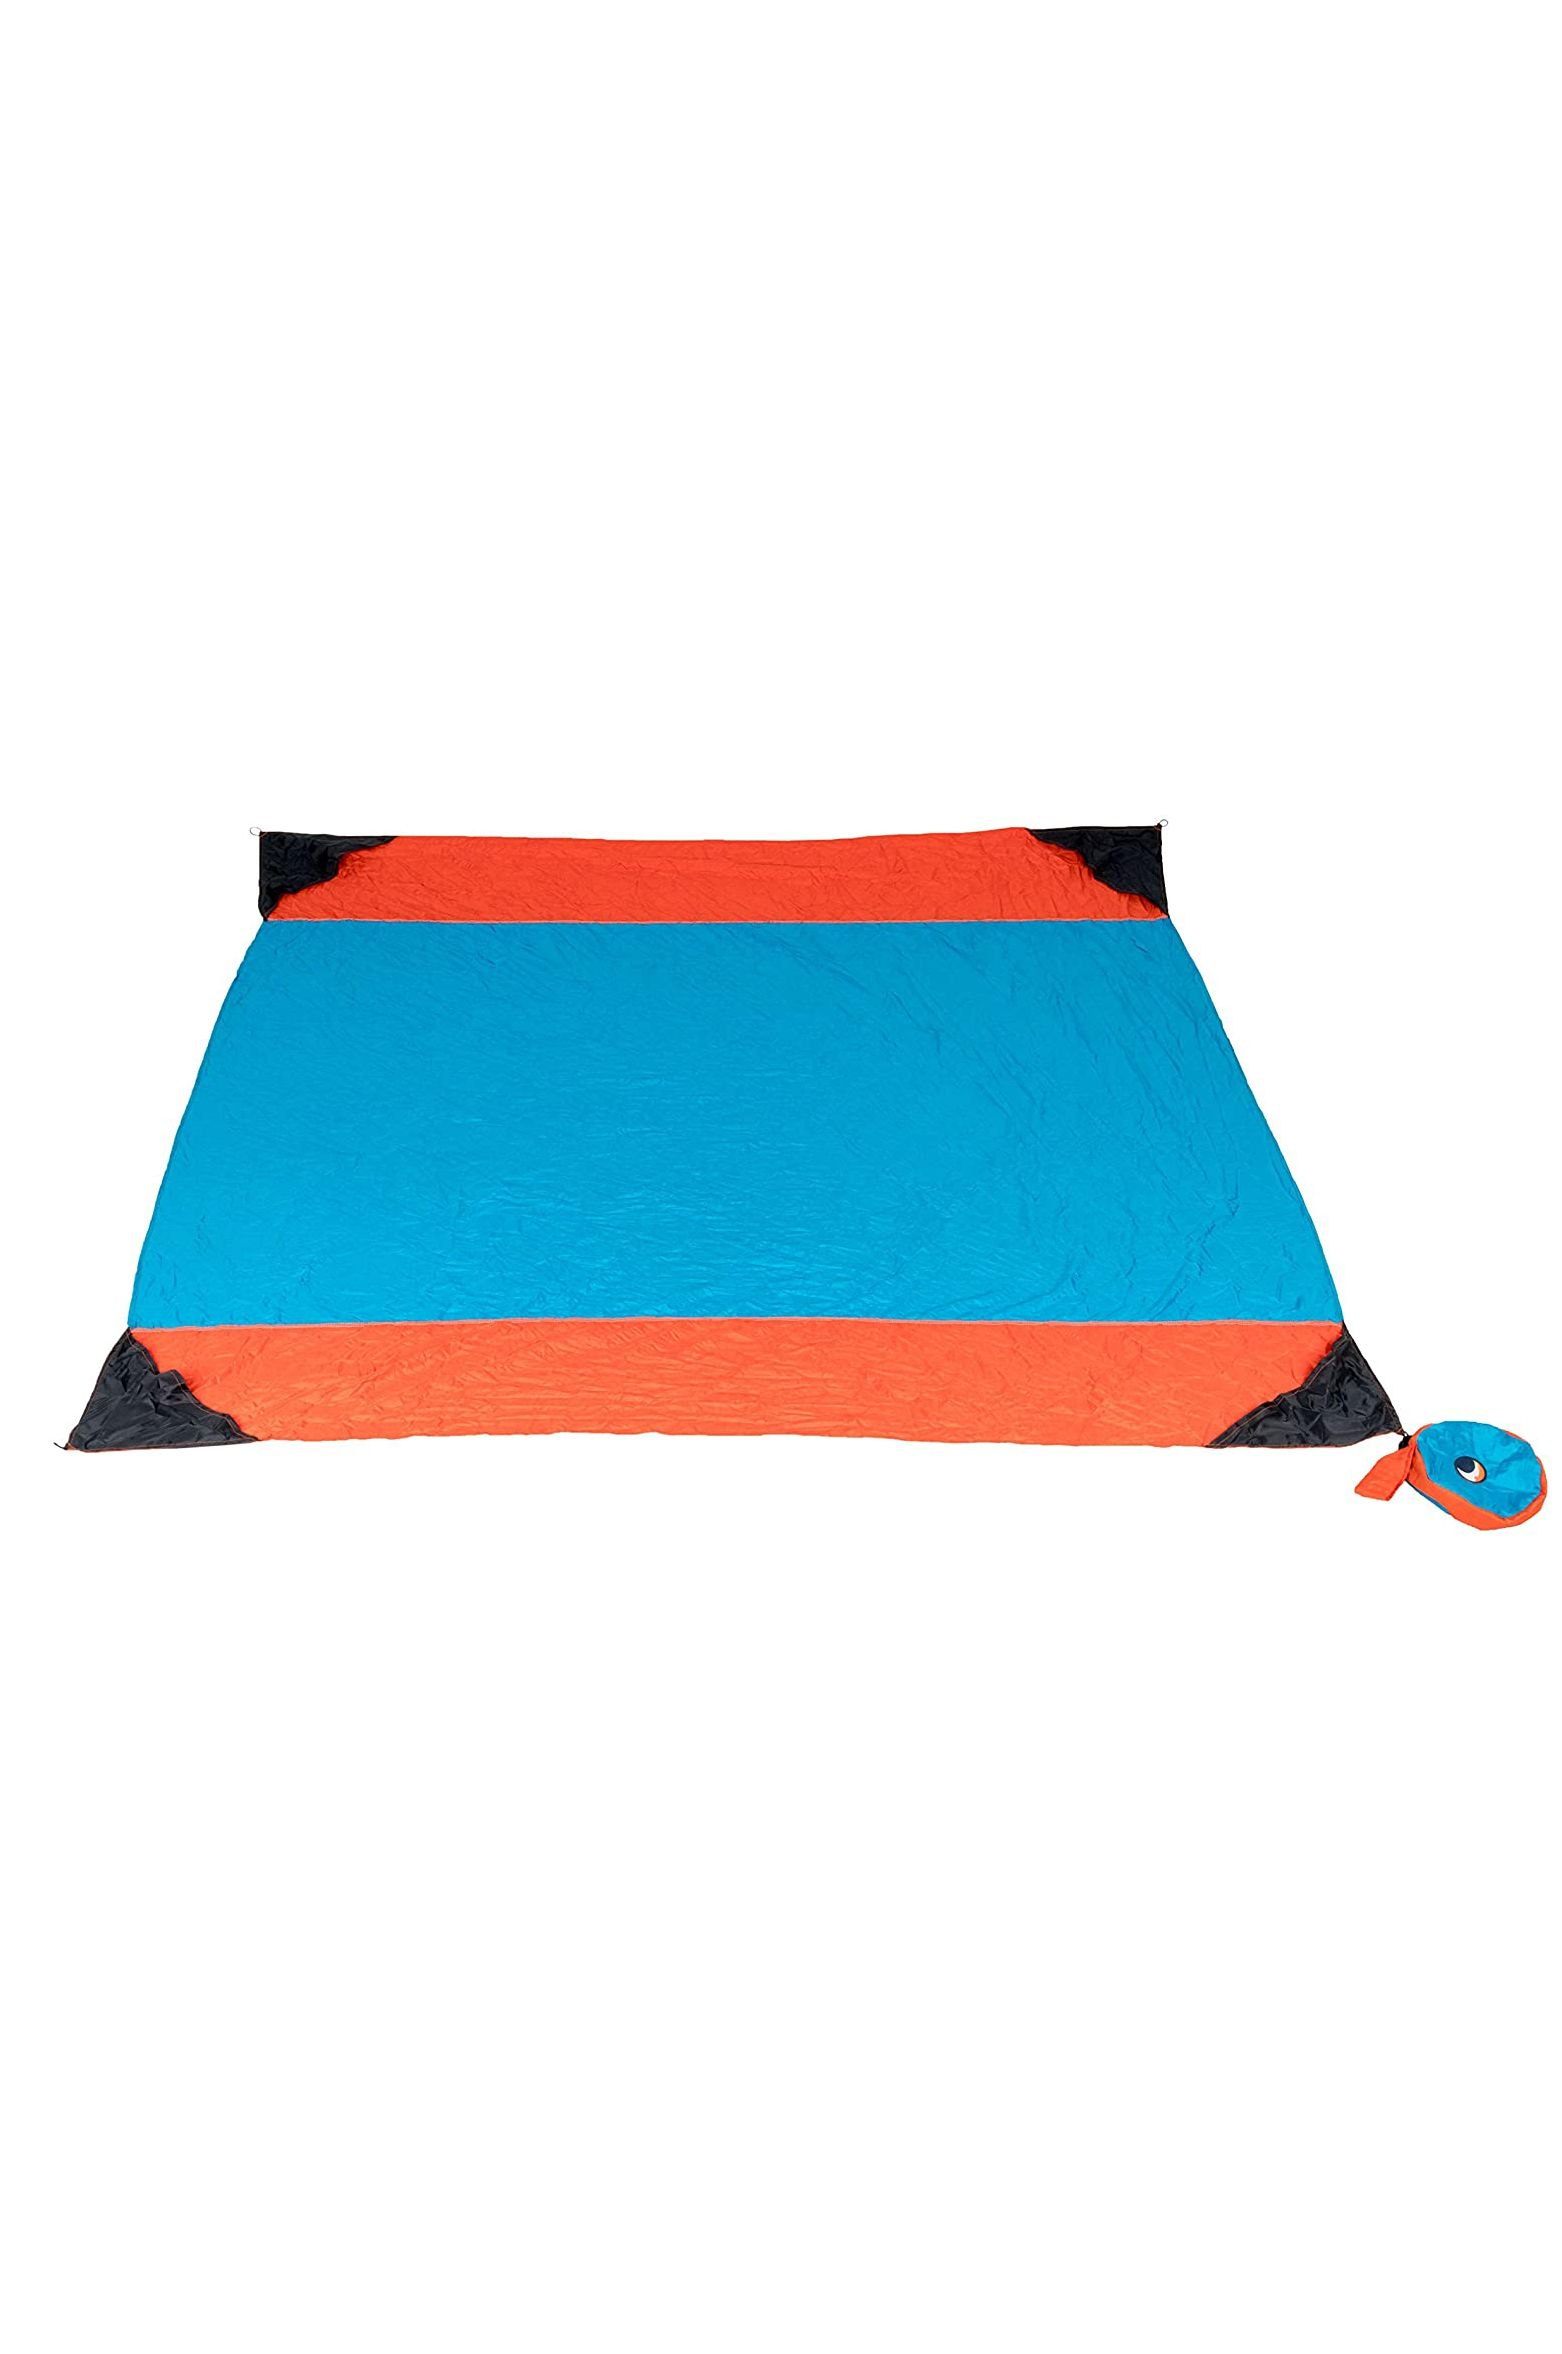 Ticket To The Moon Beach Towel BEACH BLANKET Aqua/Orange